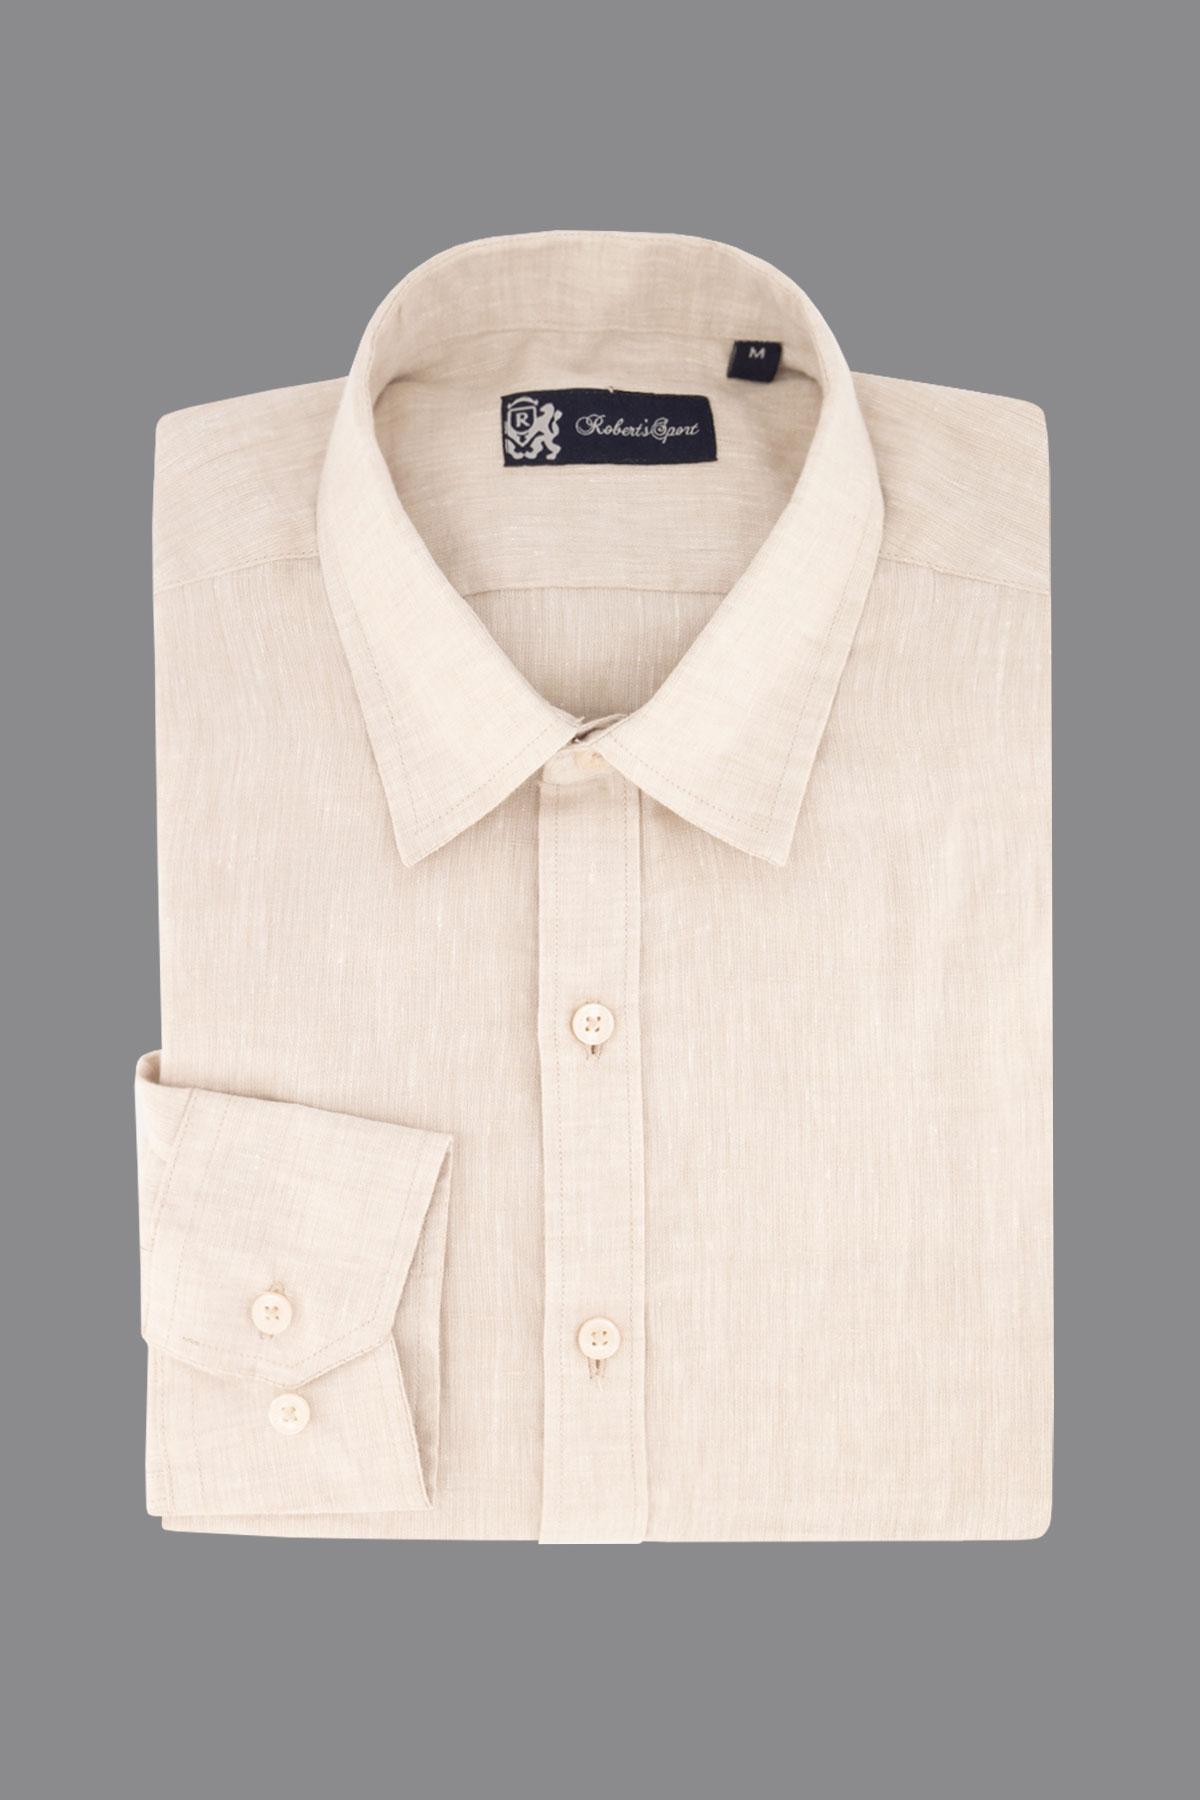 Camisa Robert´s, 100% lino,  Regular fit, color beige.